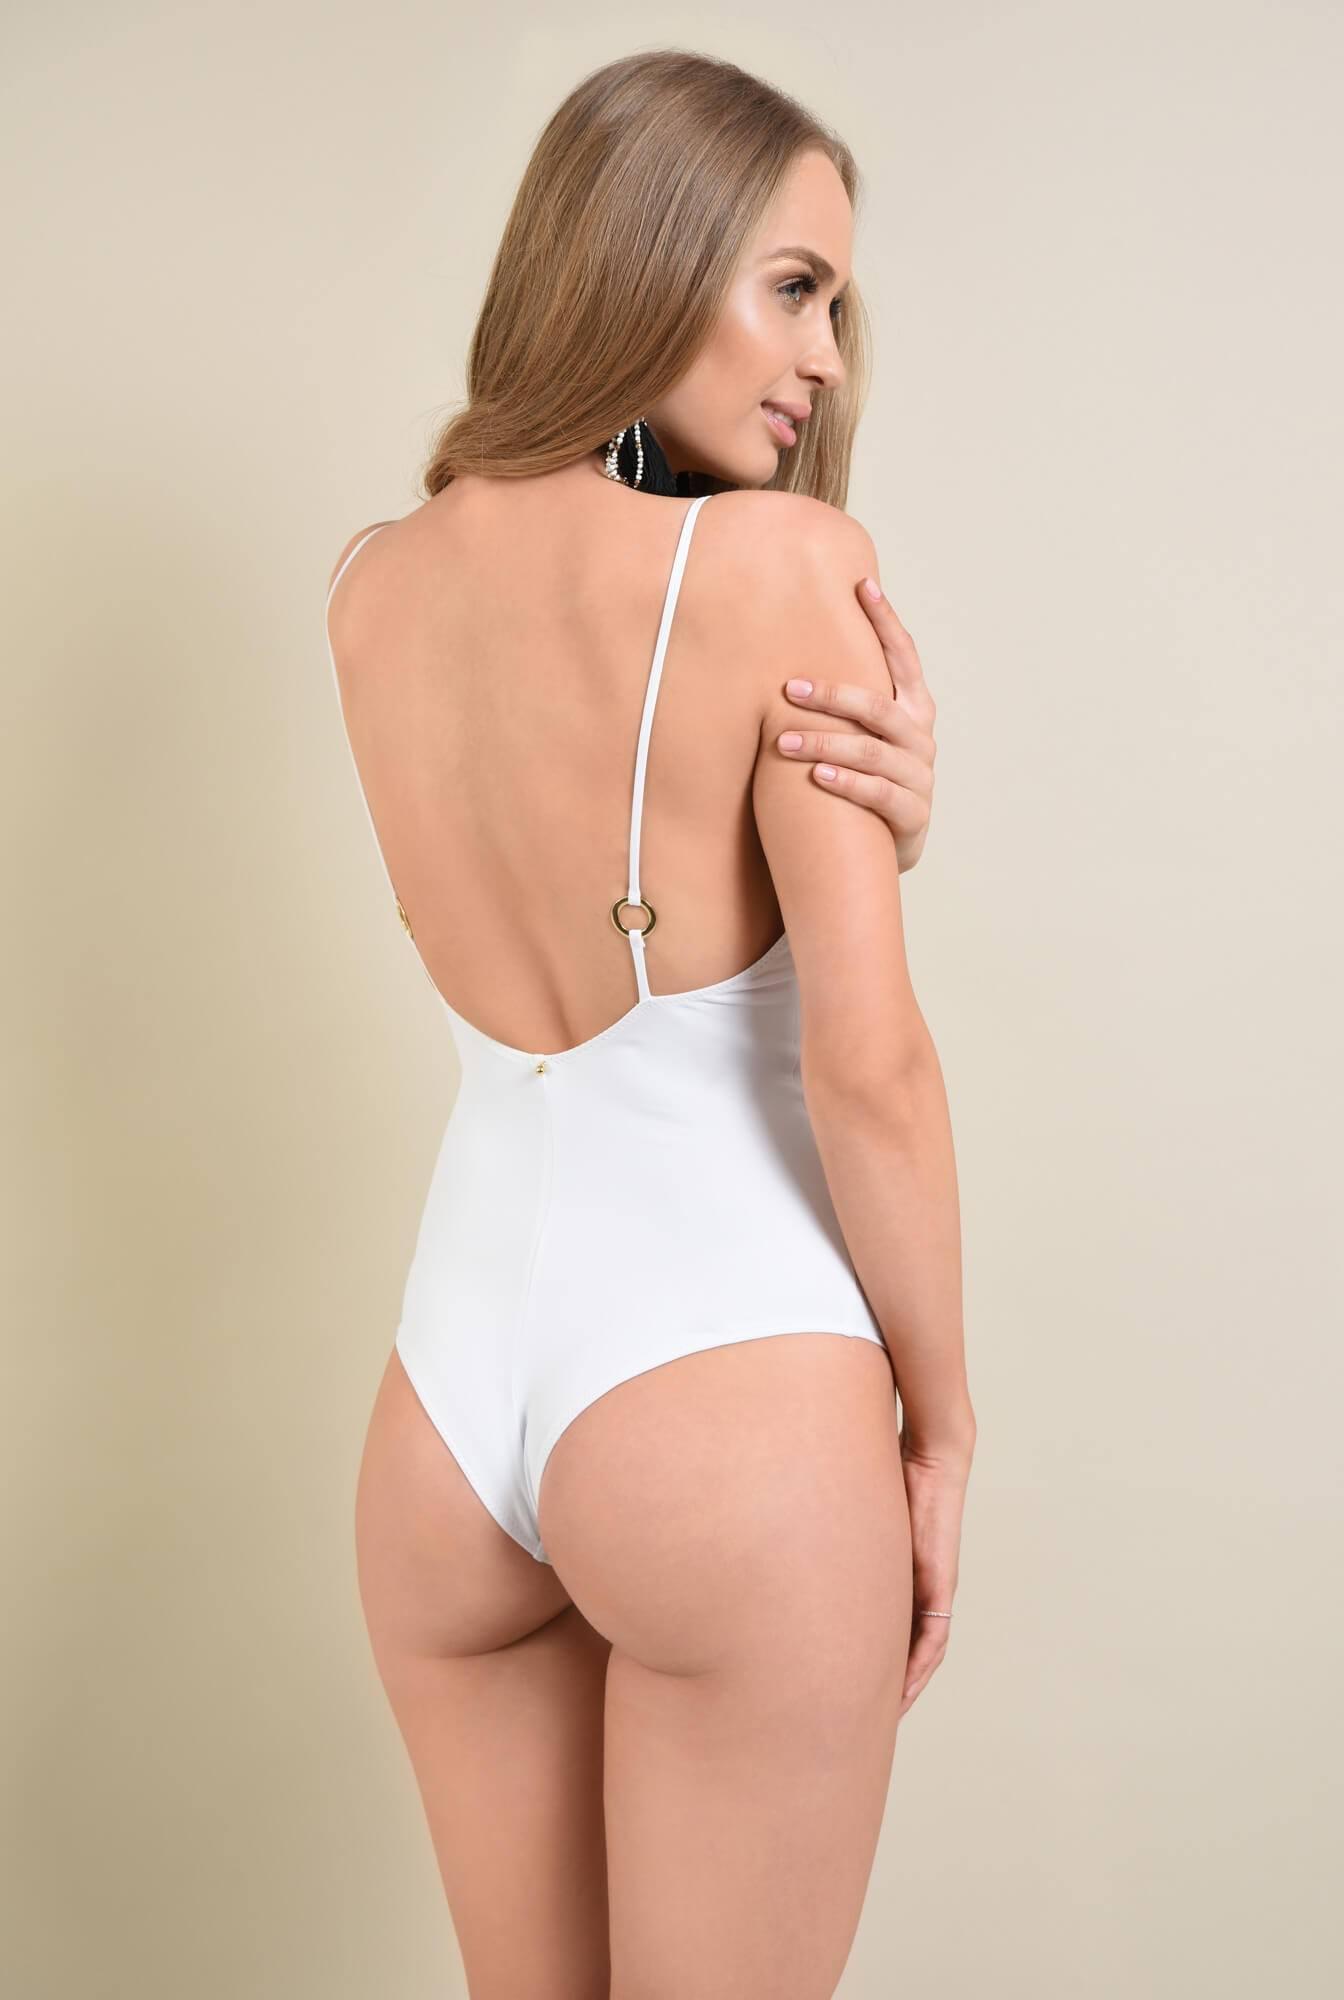 3 - costum de baie intreg, alb, decoltat